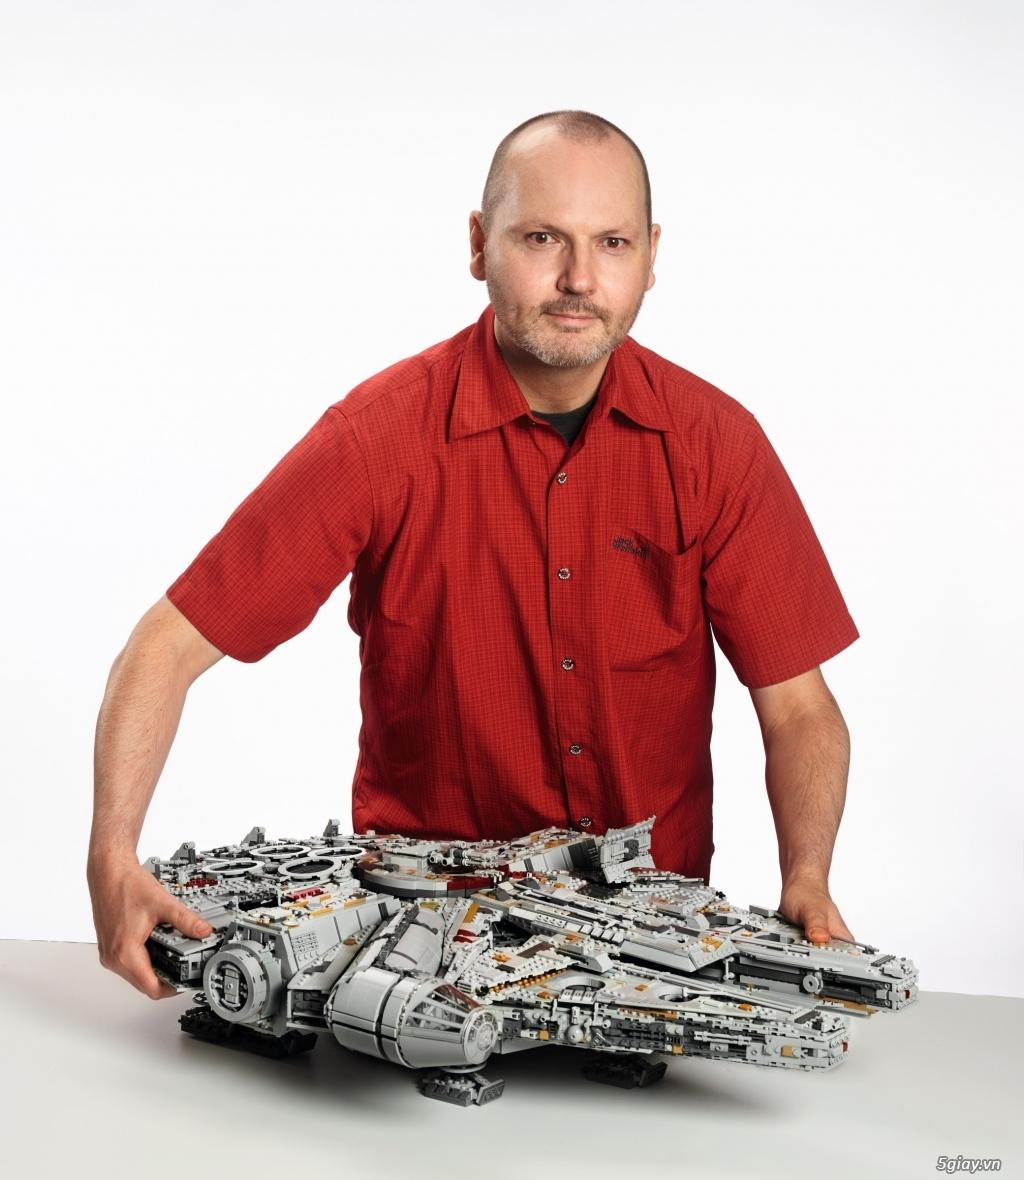 Cần bán: LEGO Star Wars Millennium Falcon 75192 - 6